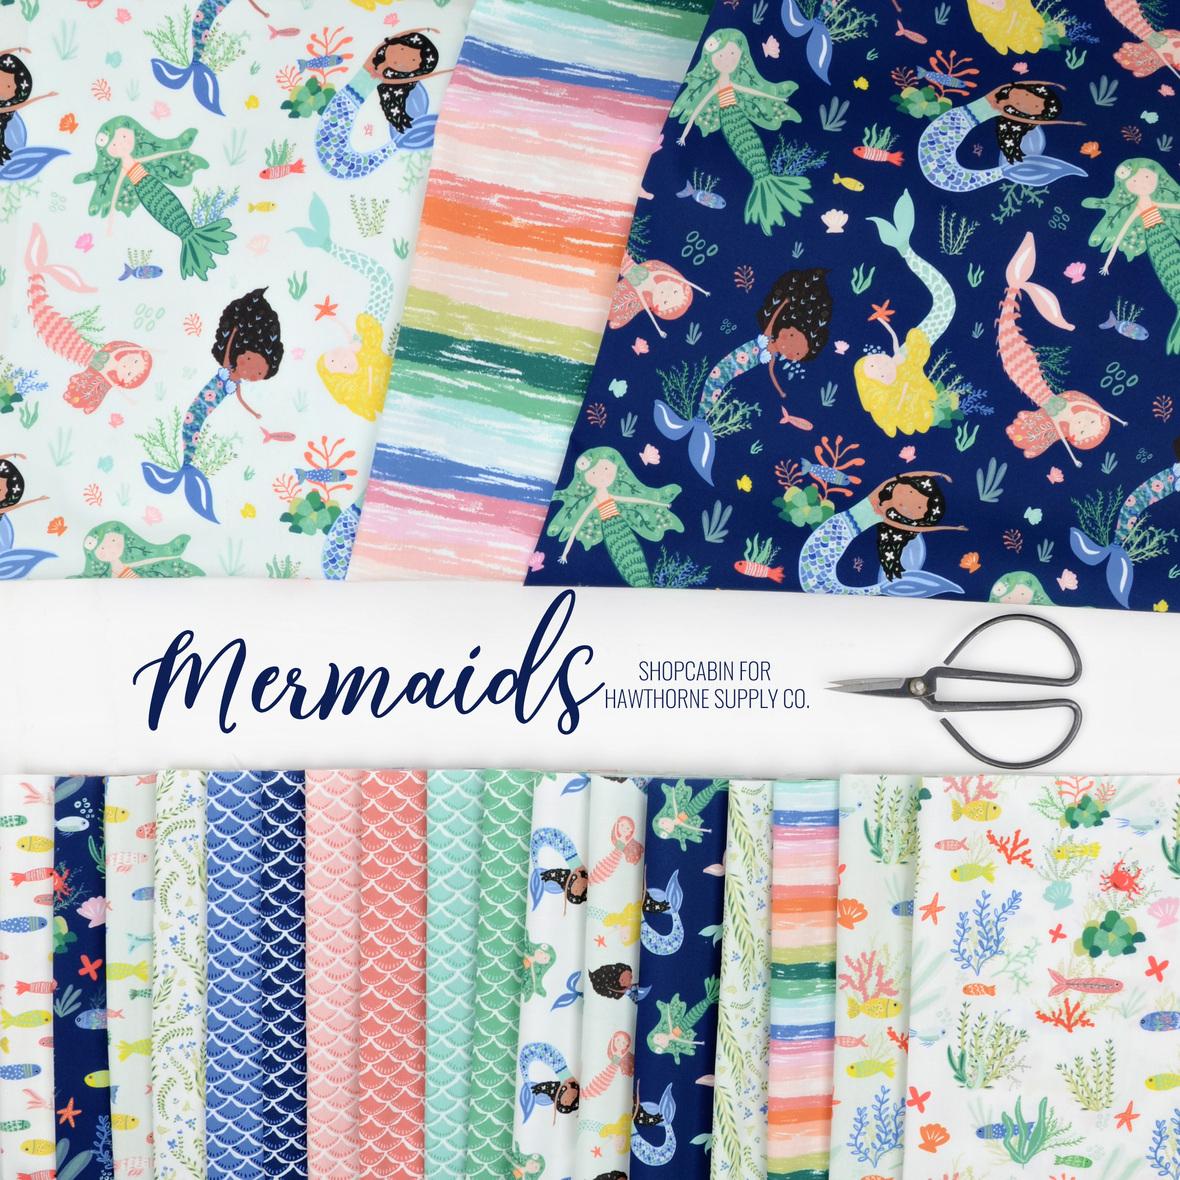 Mermaids Fabric Shopcabin for Hawthorne Supply Co.